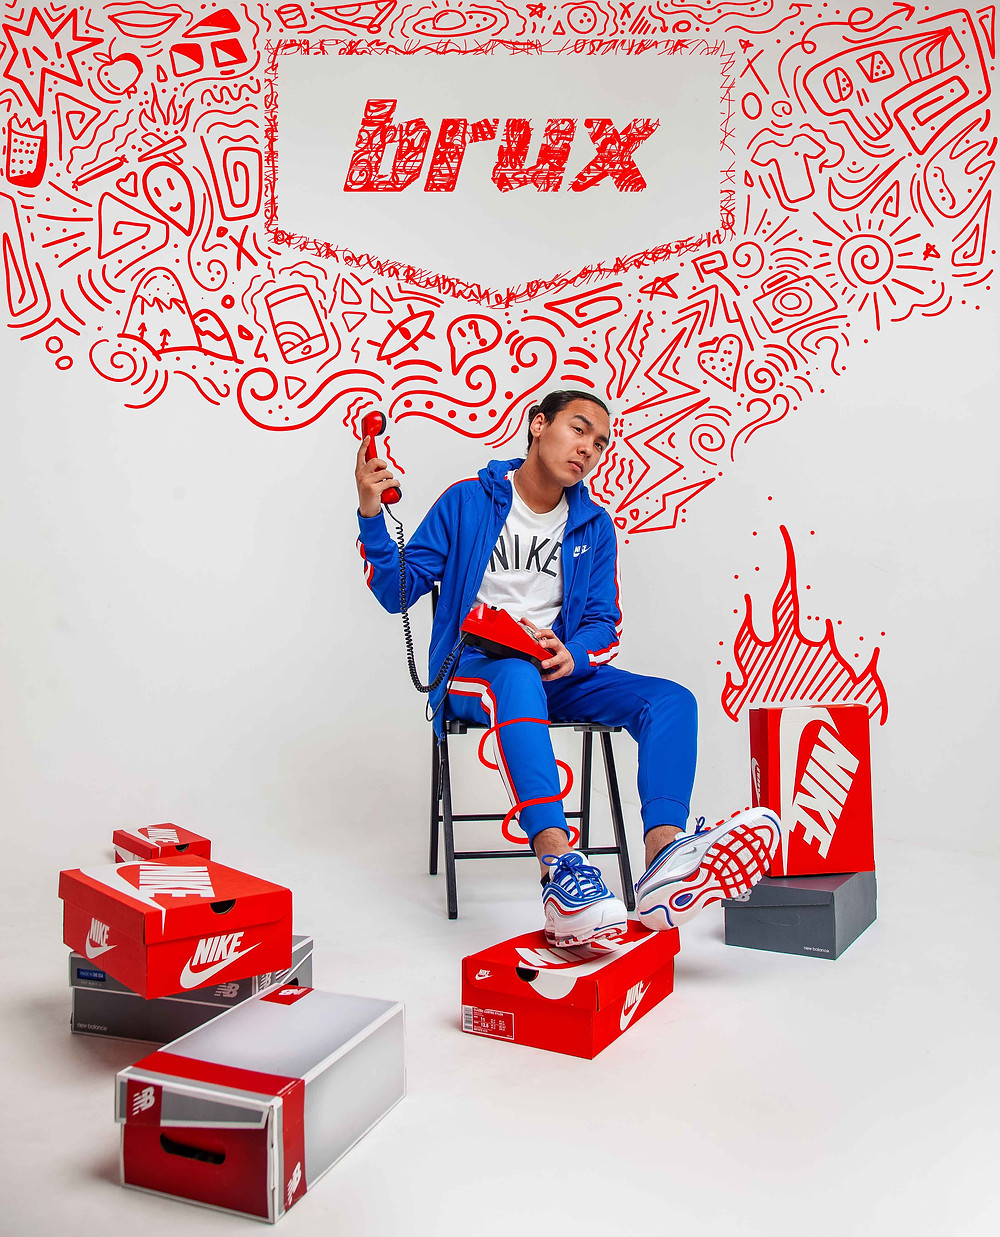 Nike Air Max 97, Brux, Nike,  Синий спортивный костюм Nike